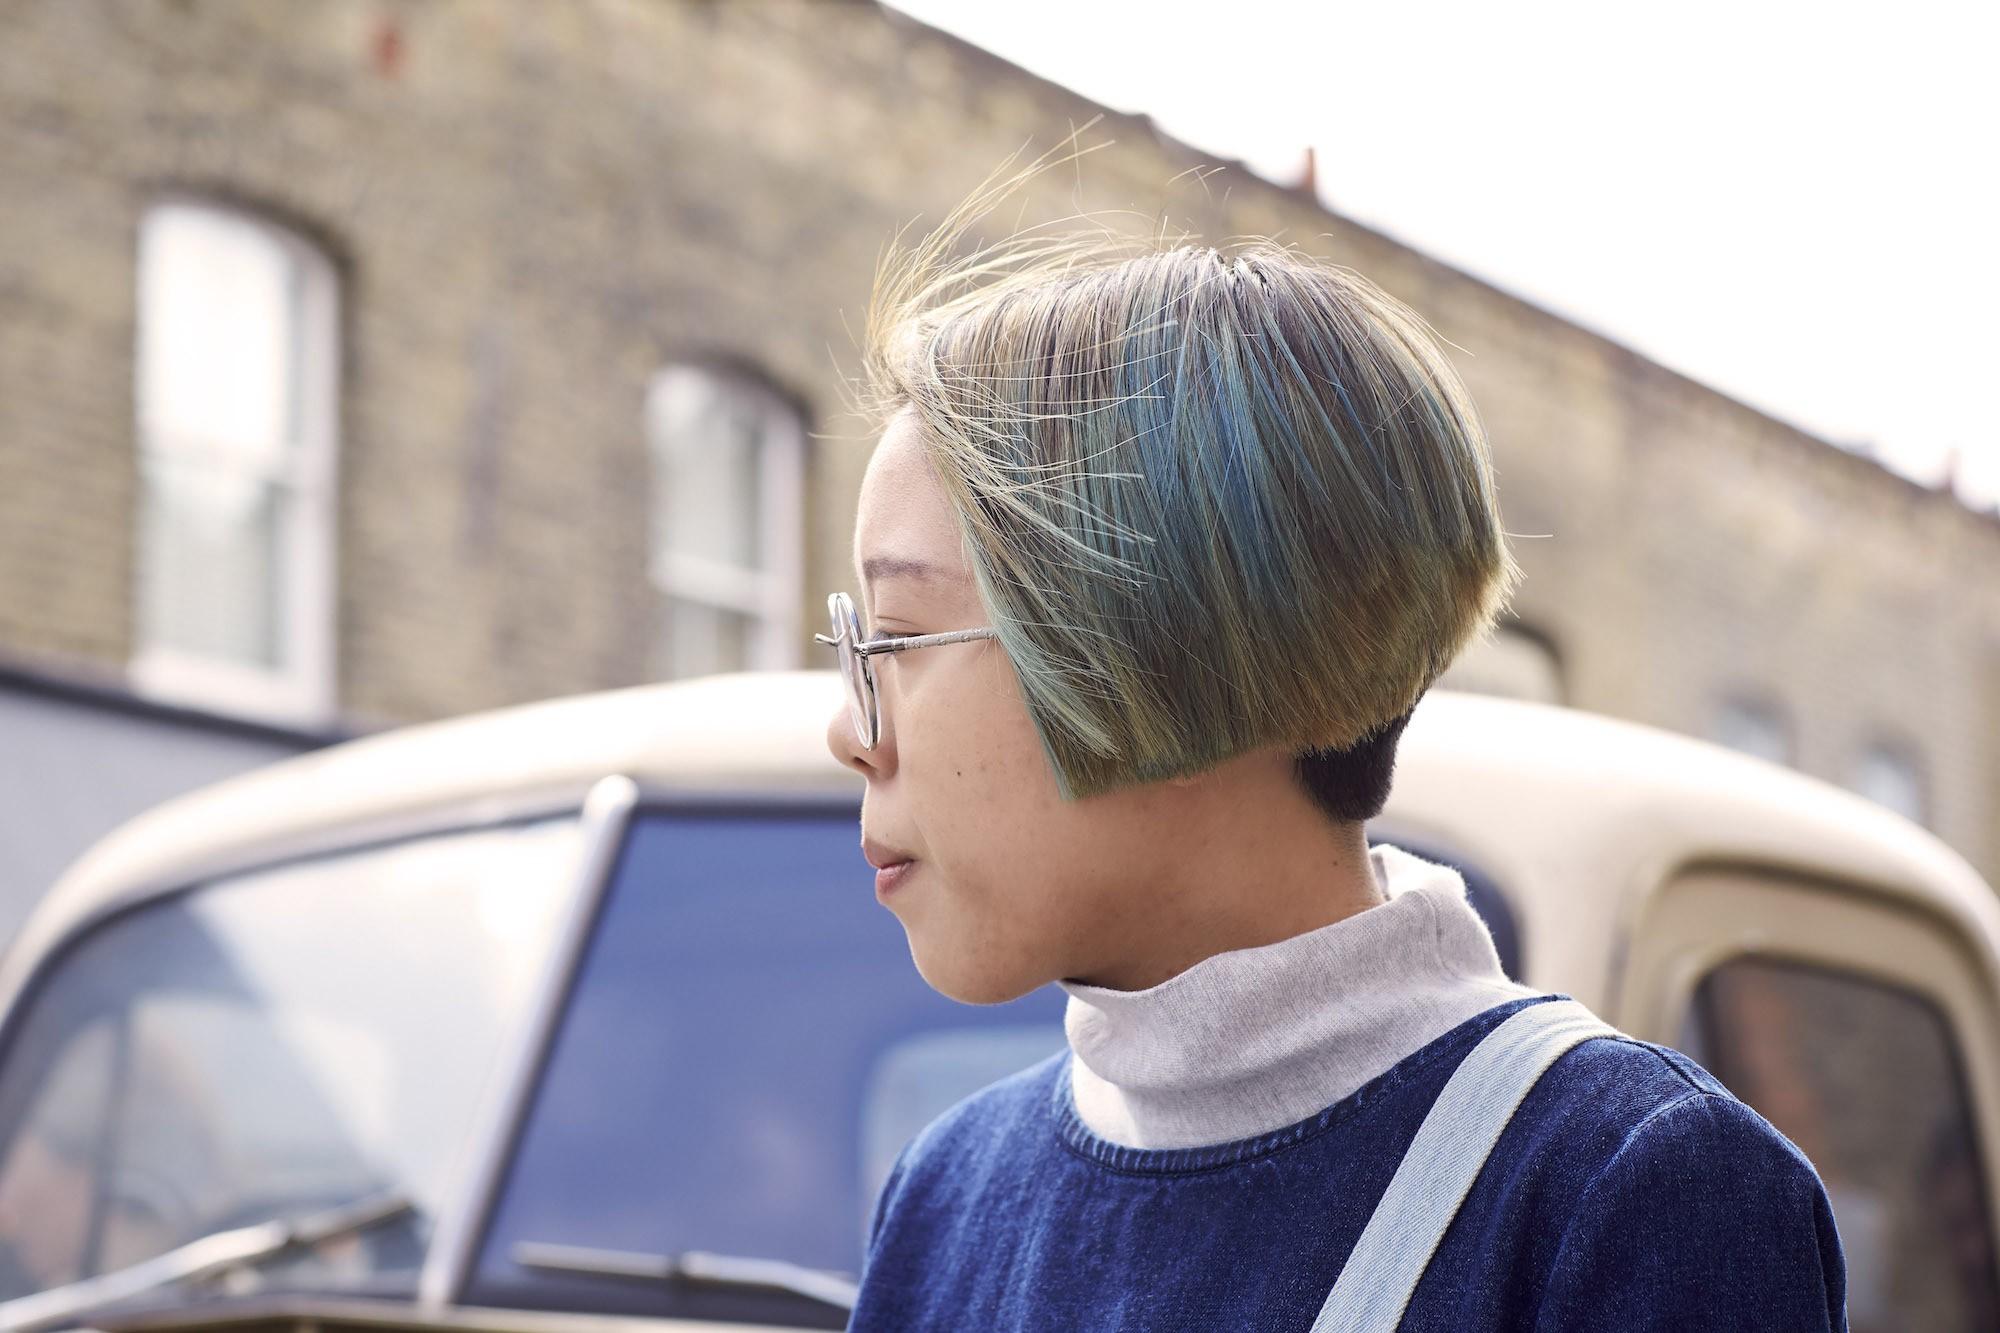 Warna rambut pastel campuran hijau muda dan biru pastel.